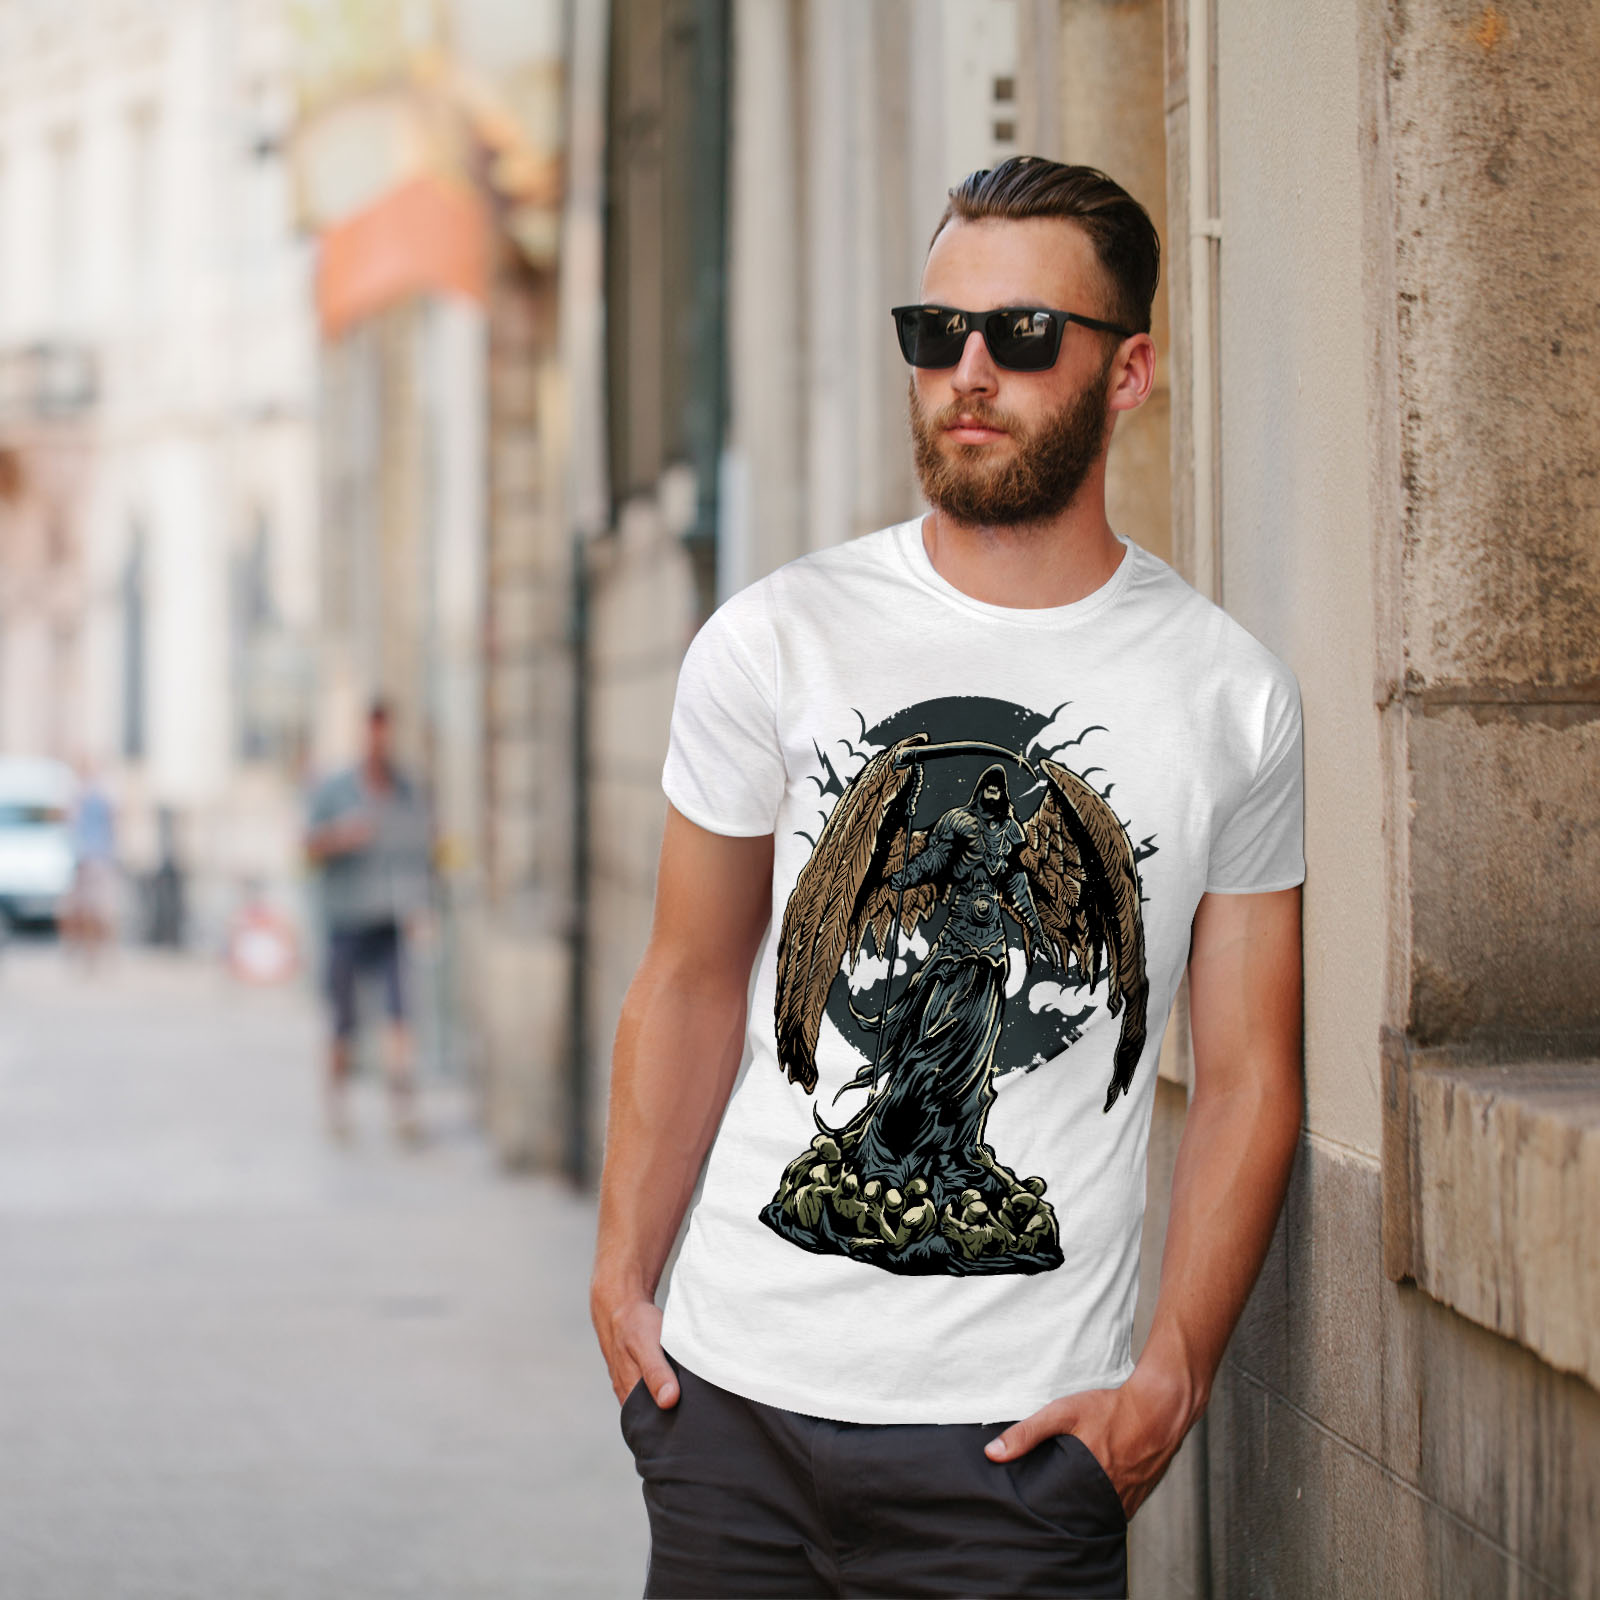 Wellcoda-Evil-Grim-Reaper-Mens-T-shirt-Horror-Graphic-Design-Printed-Tee thumbnail 11